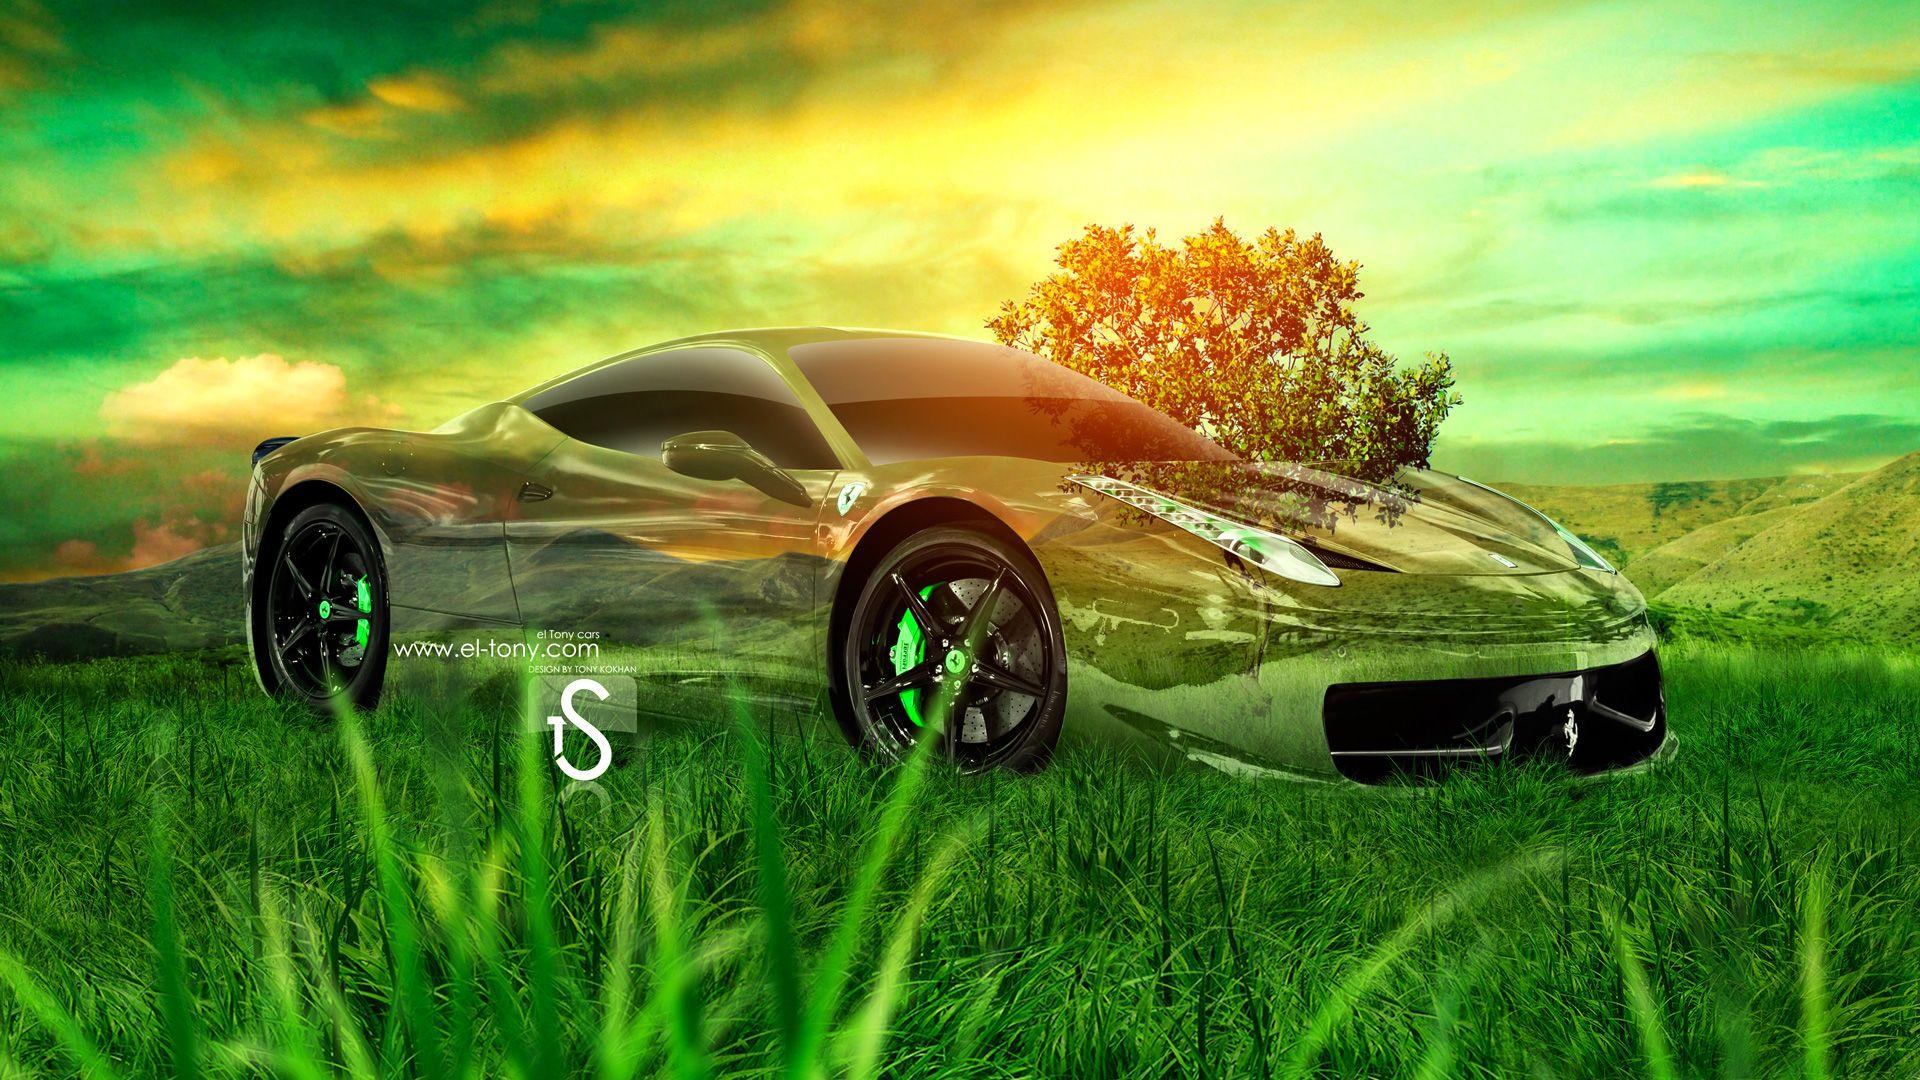 Black Sports Car Wallpaper   Google Search | Automobiles | Pinterest |  Ferrari And Wallpaper